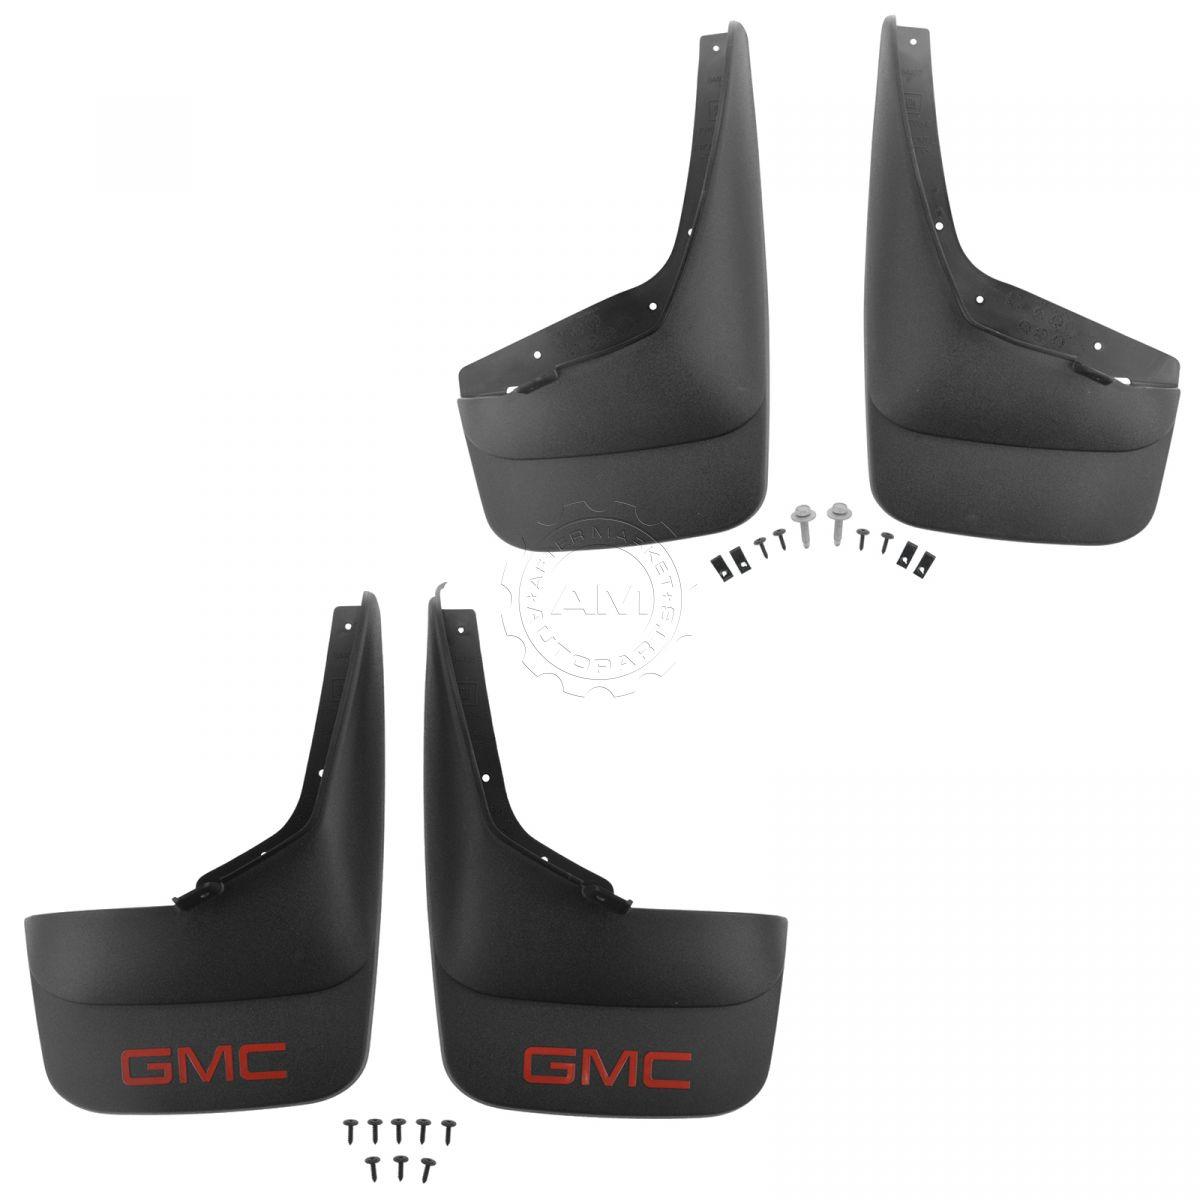 OEM Splash Guard Mud Flap Front Rear Set of 4 Molded Black for GMC Pickup Truck